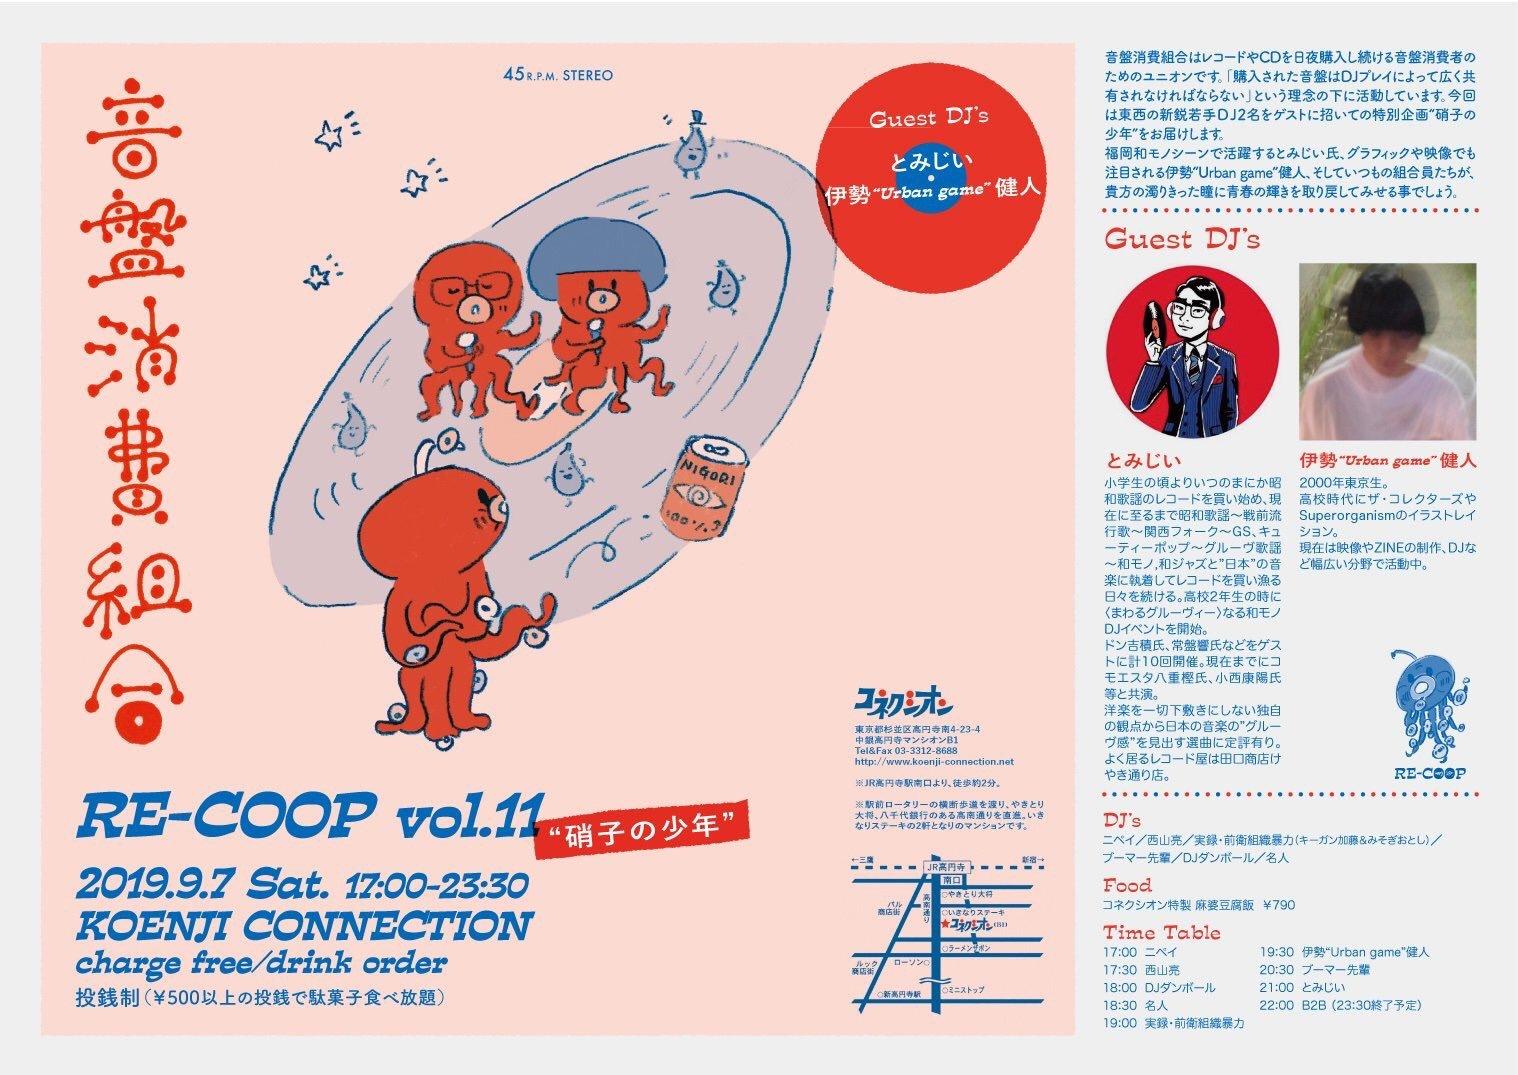 "09/07(土)音盤消費組合RE-COOP vol.11 ""硝子の少年""_c0099300_14405580.jpg"